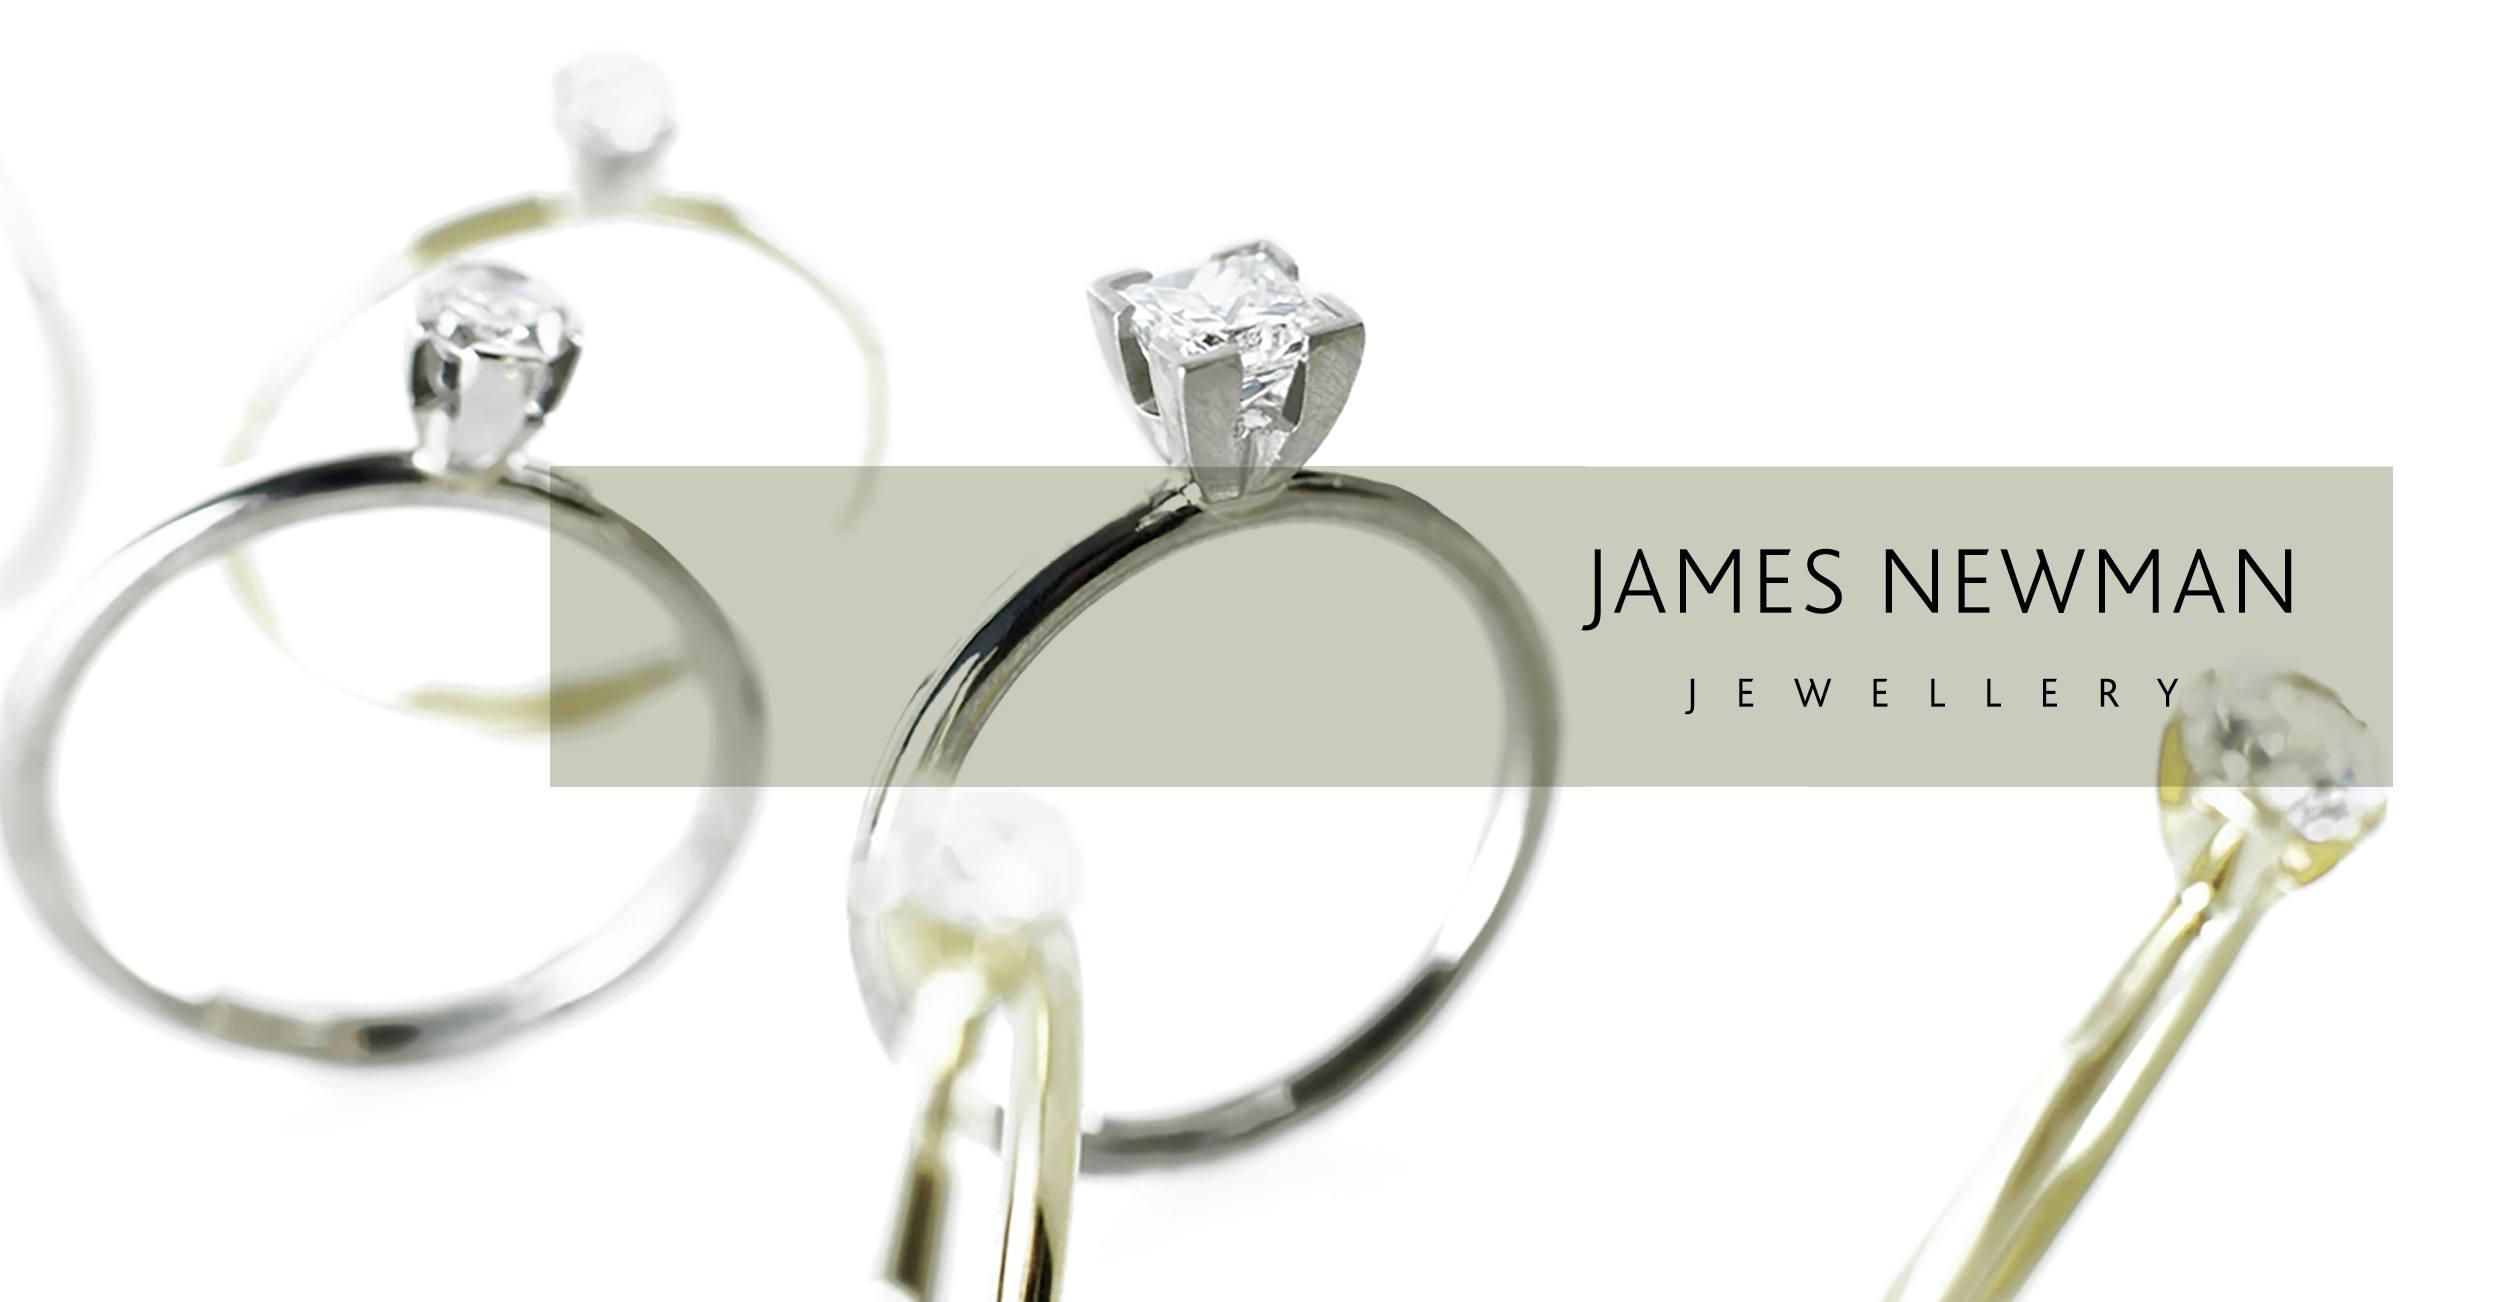 James Newman Jewellery - Identity Visual